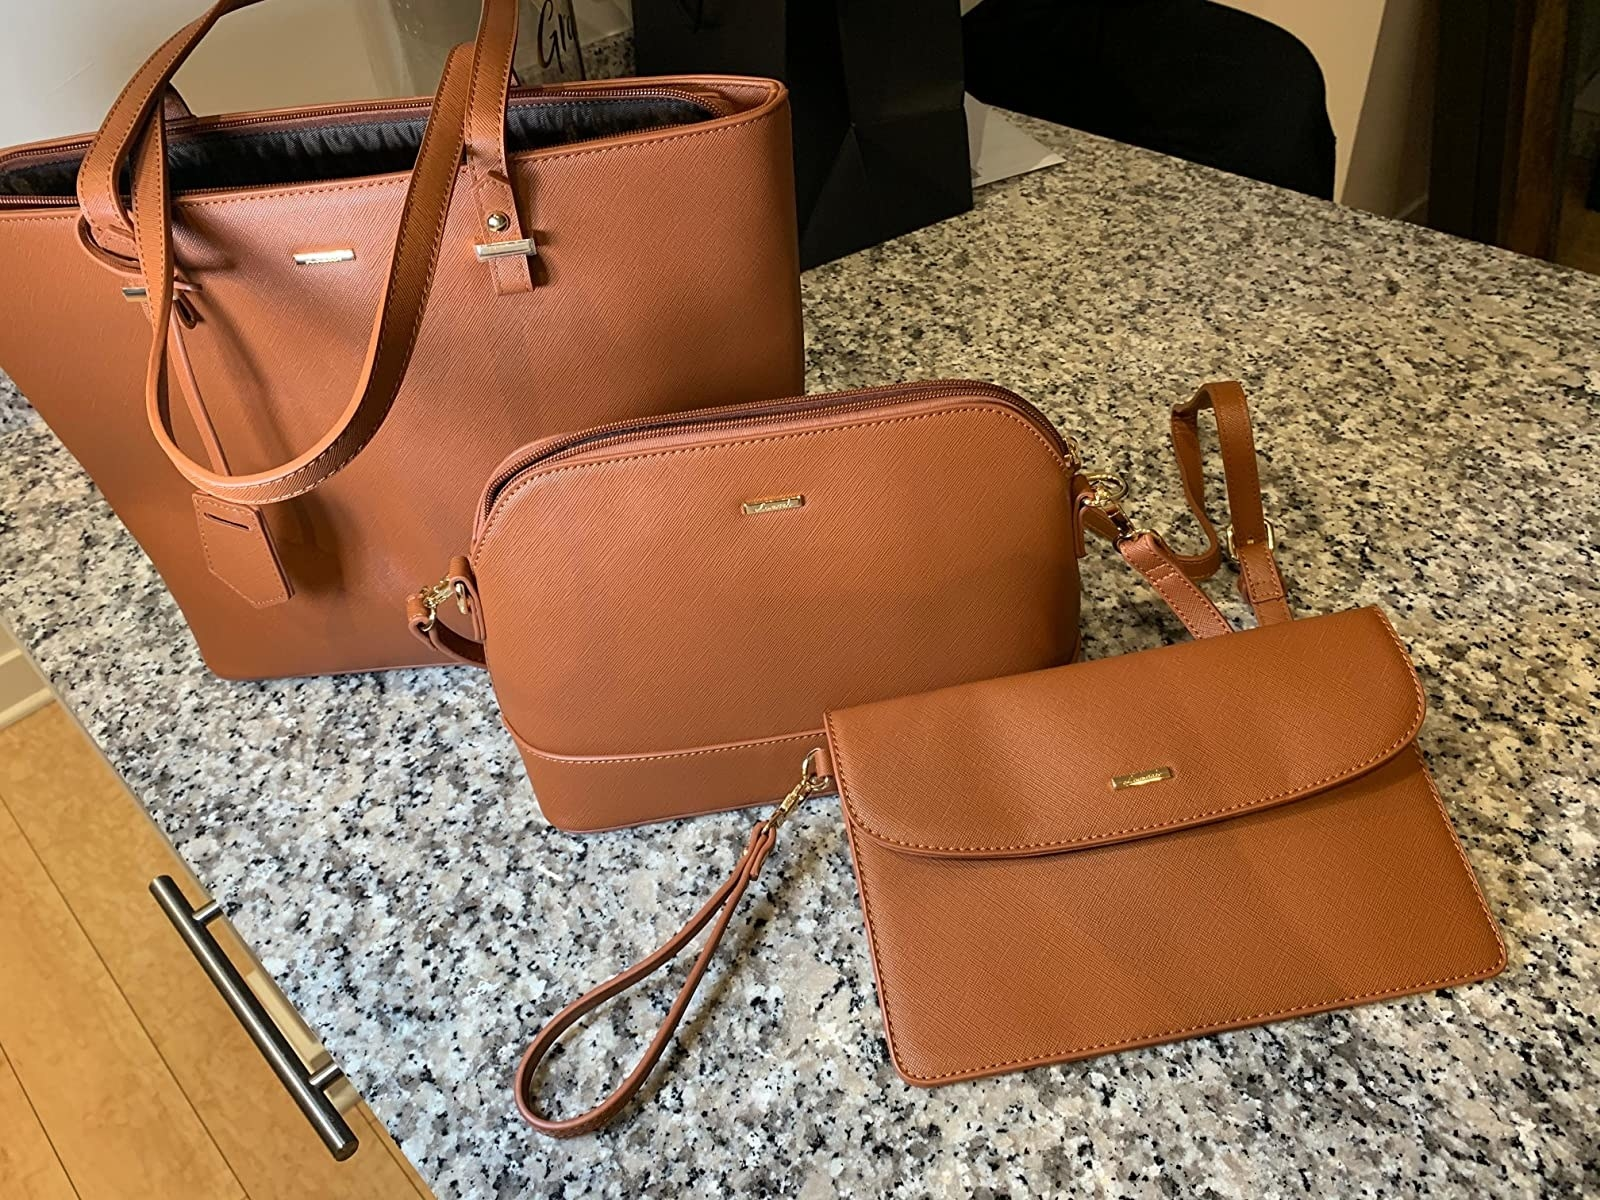 Three piece purse set on table